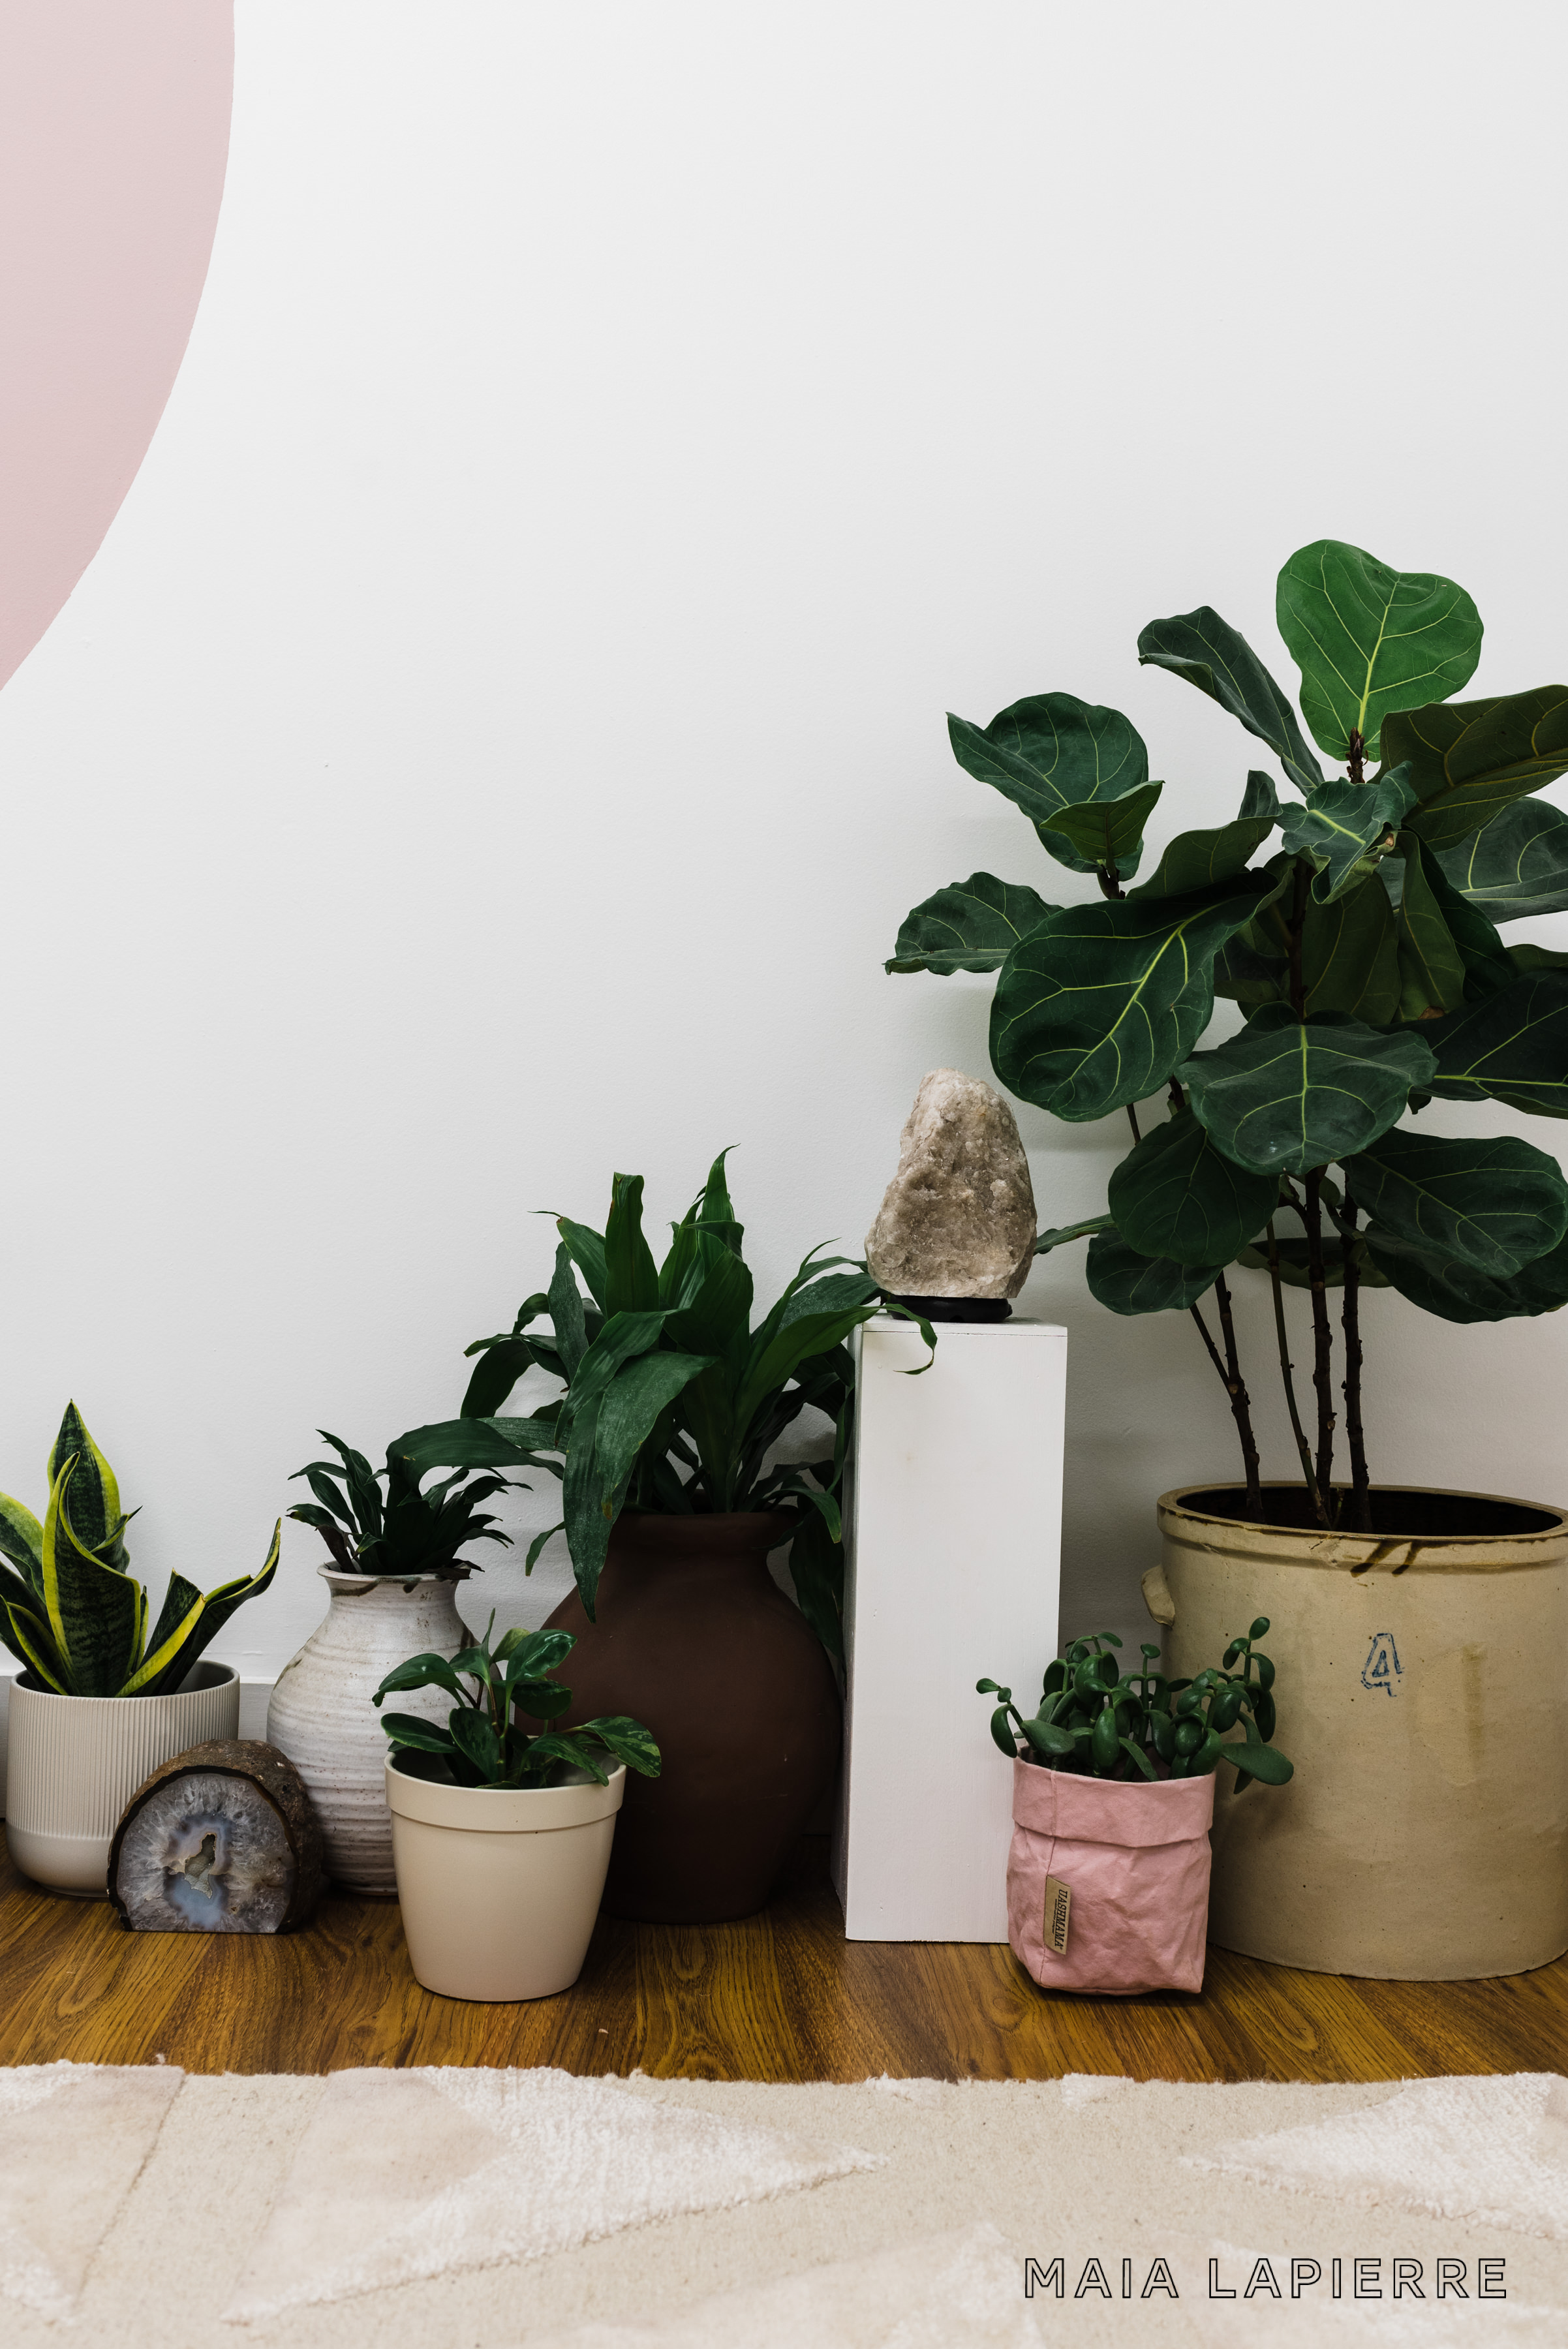 Maia LaPierre Interiors - Flo Meditation Studio Plants